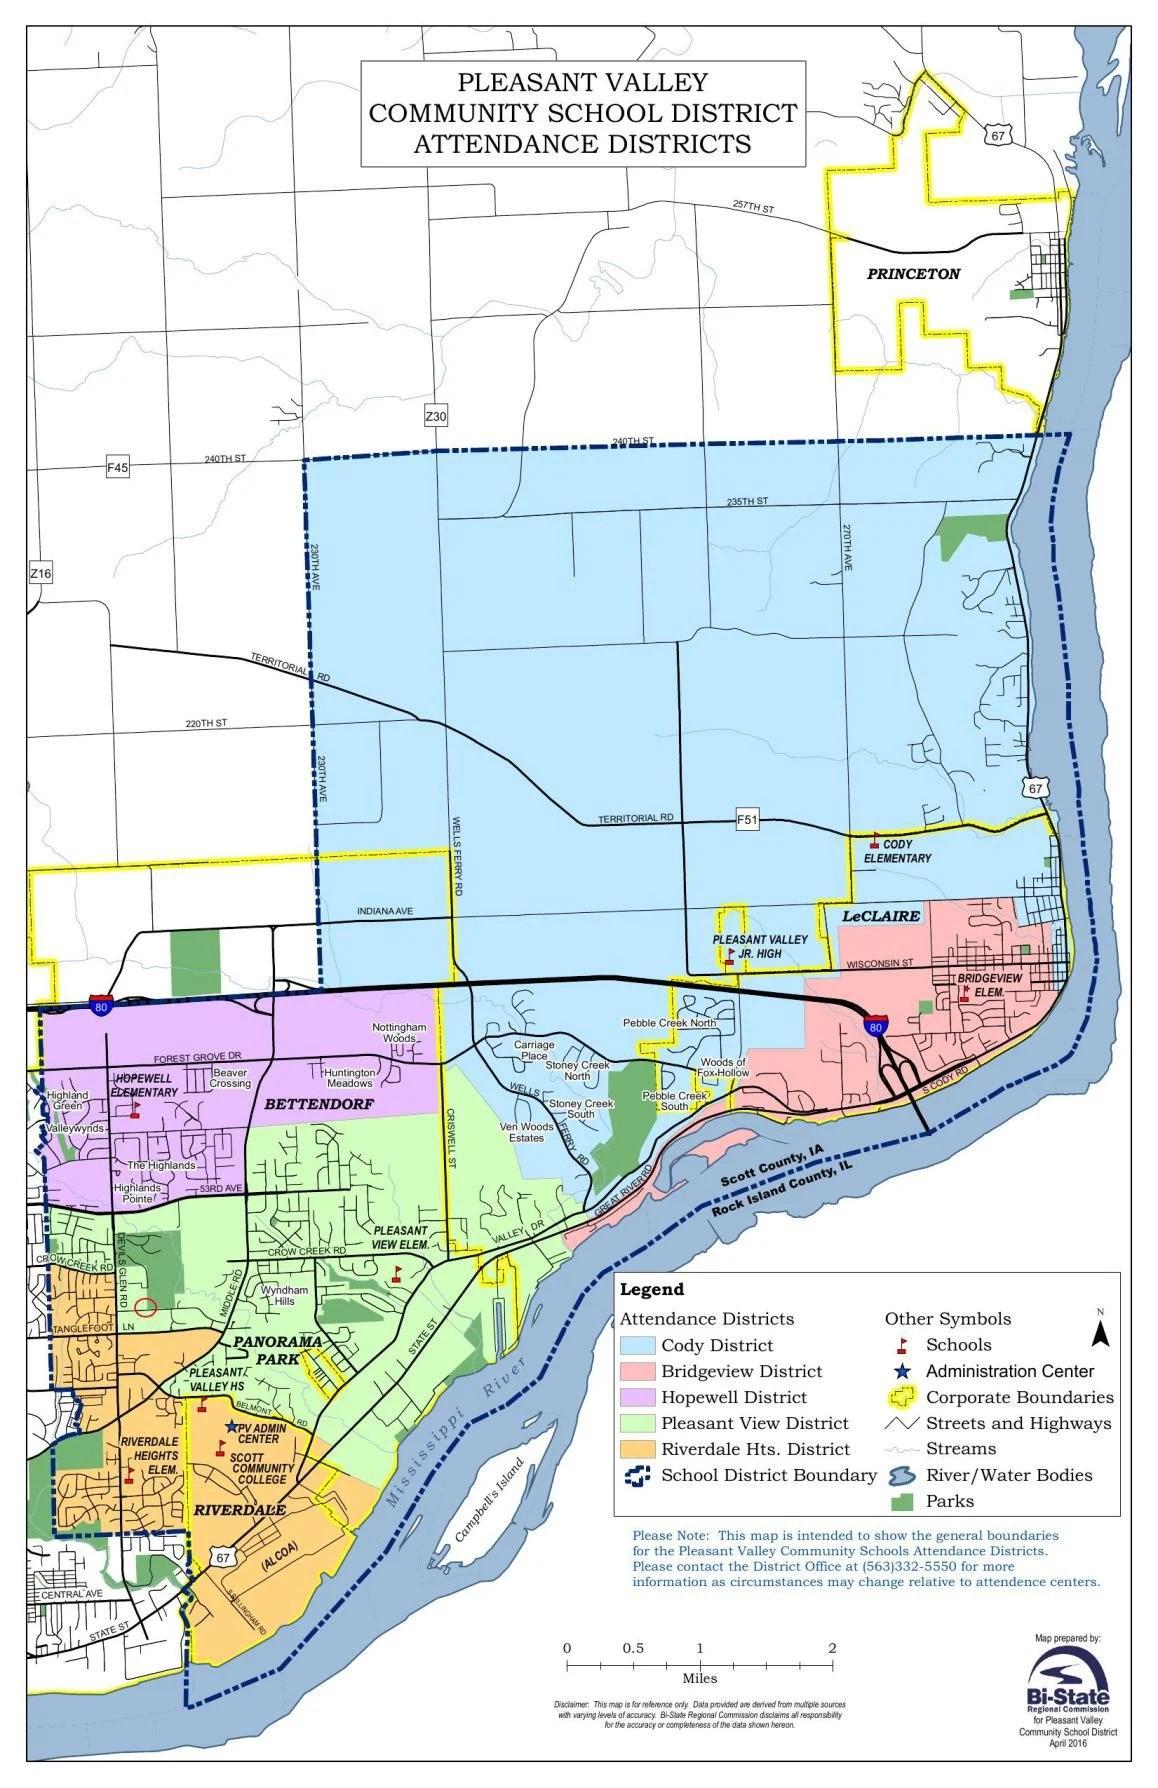 Pleasent Valley Map : pleasent, valley, Pleasant, Valley, School, District, Attendance, Areas, Qctimes.com